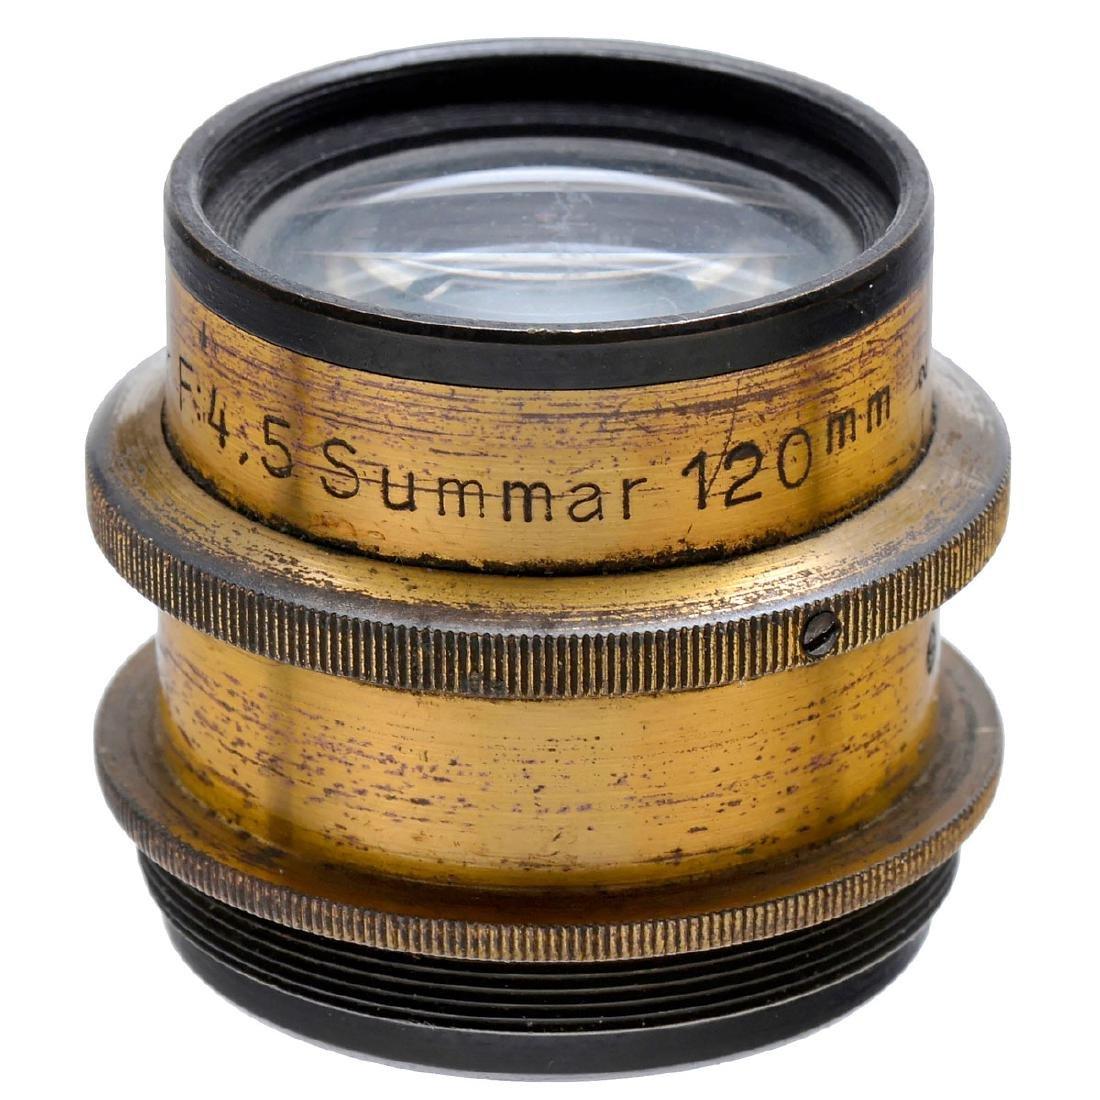 "Early Leitz ""Summar 4,5/120 mm"" Lens, c. 1905 - 2"